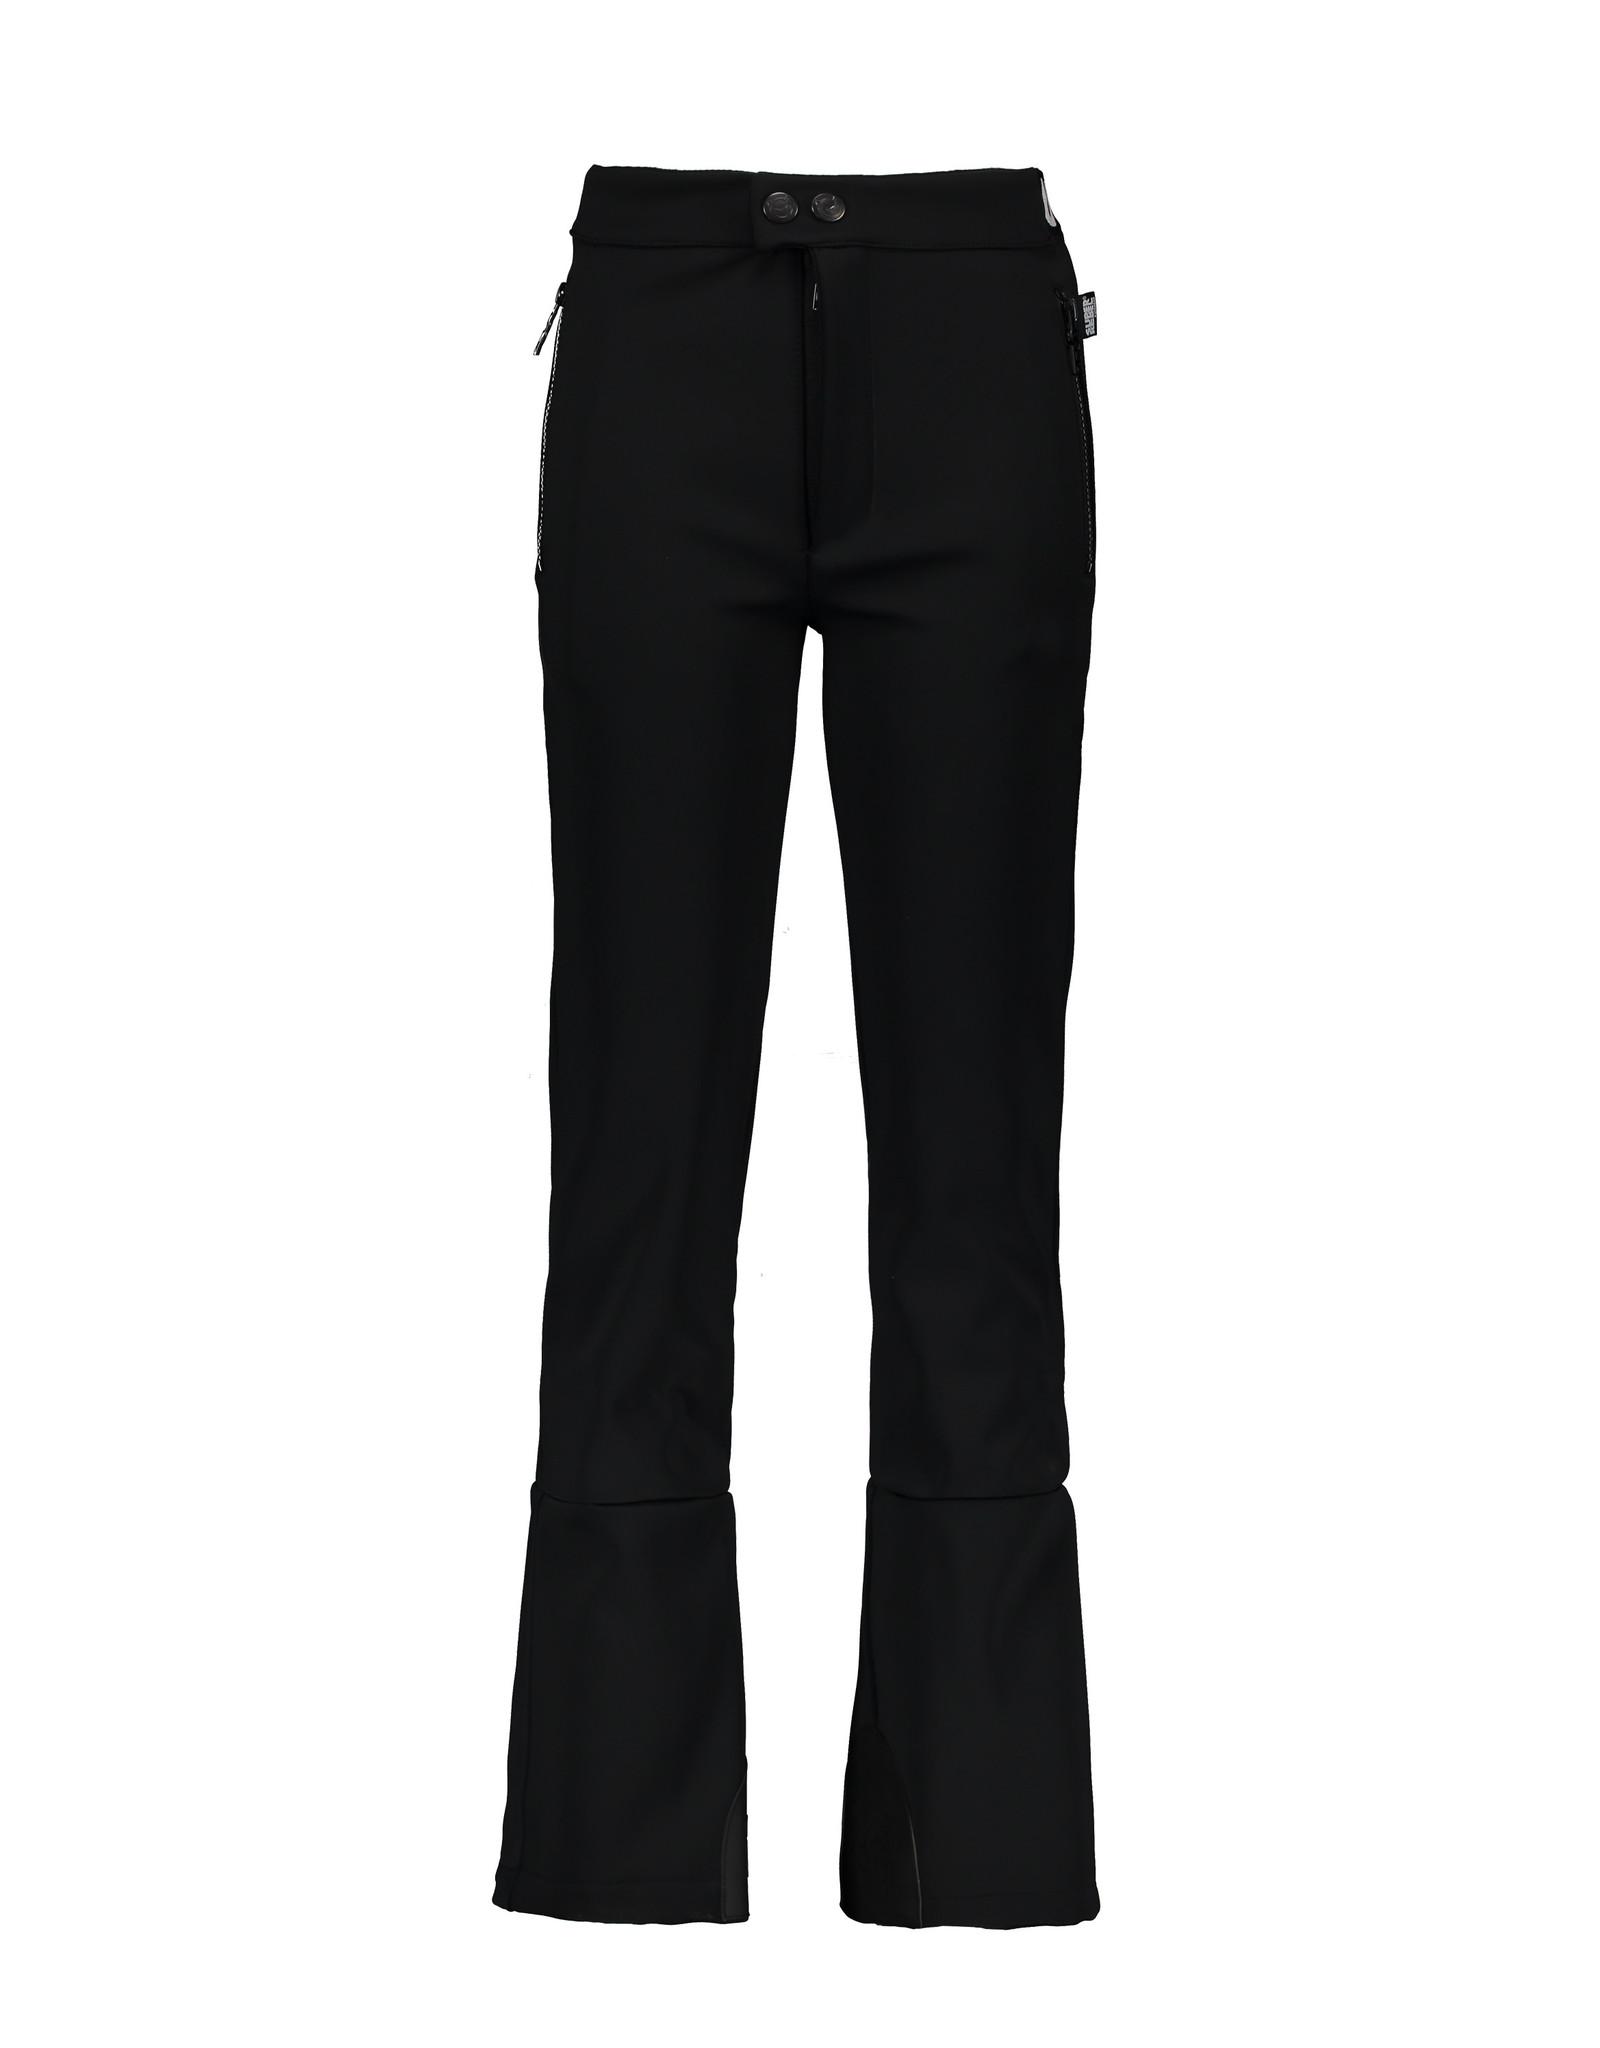 Super Rebel Super Rebel Ski Trousers Soft Shell BLACK